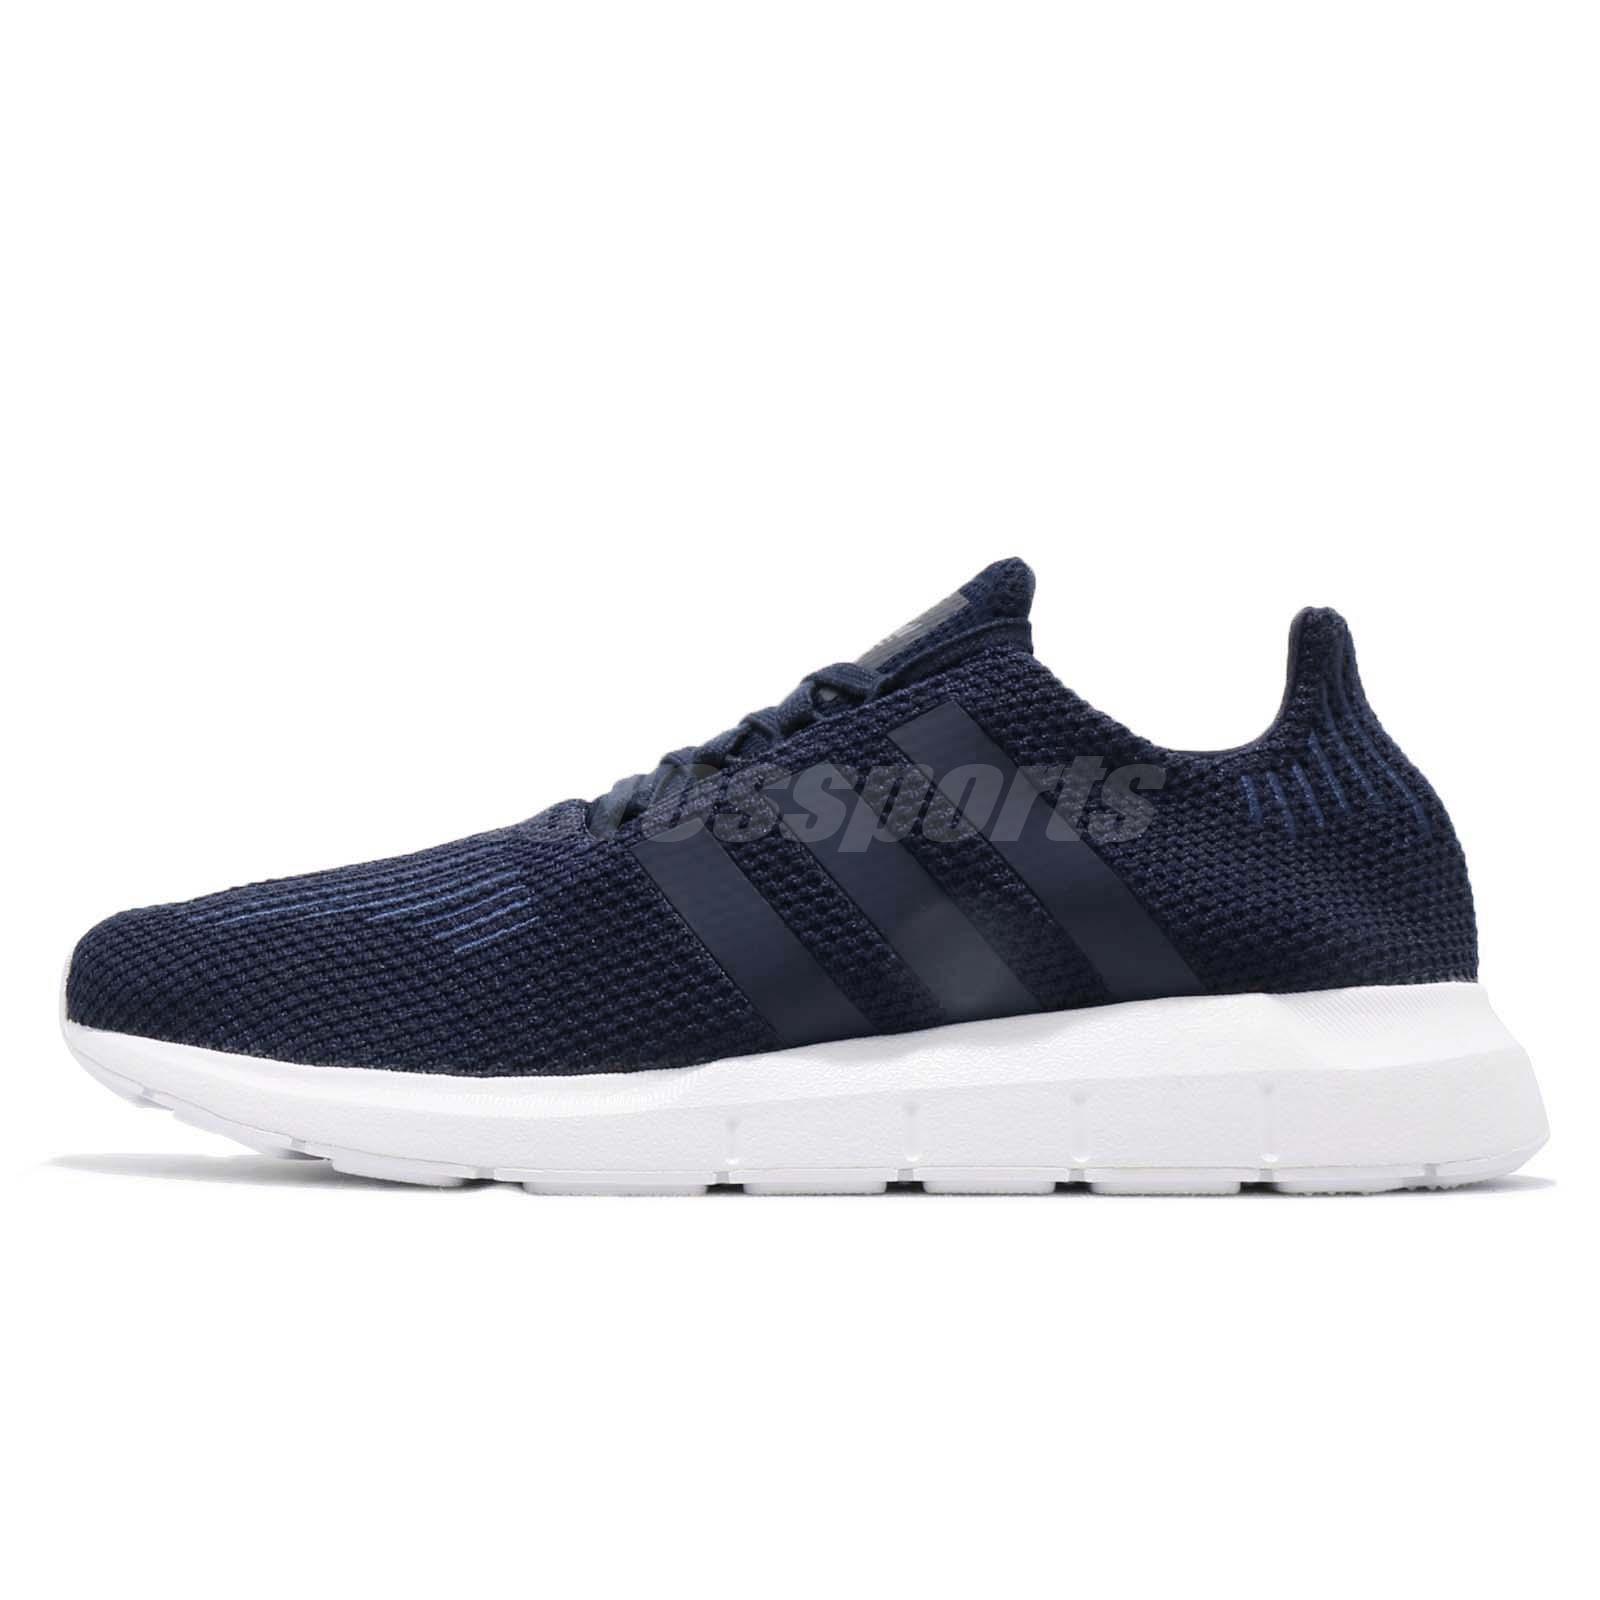 B37727 Adidas Originals Swift Run Men Shoes Collegiate NavyWhite